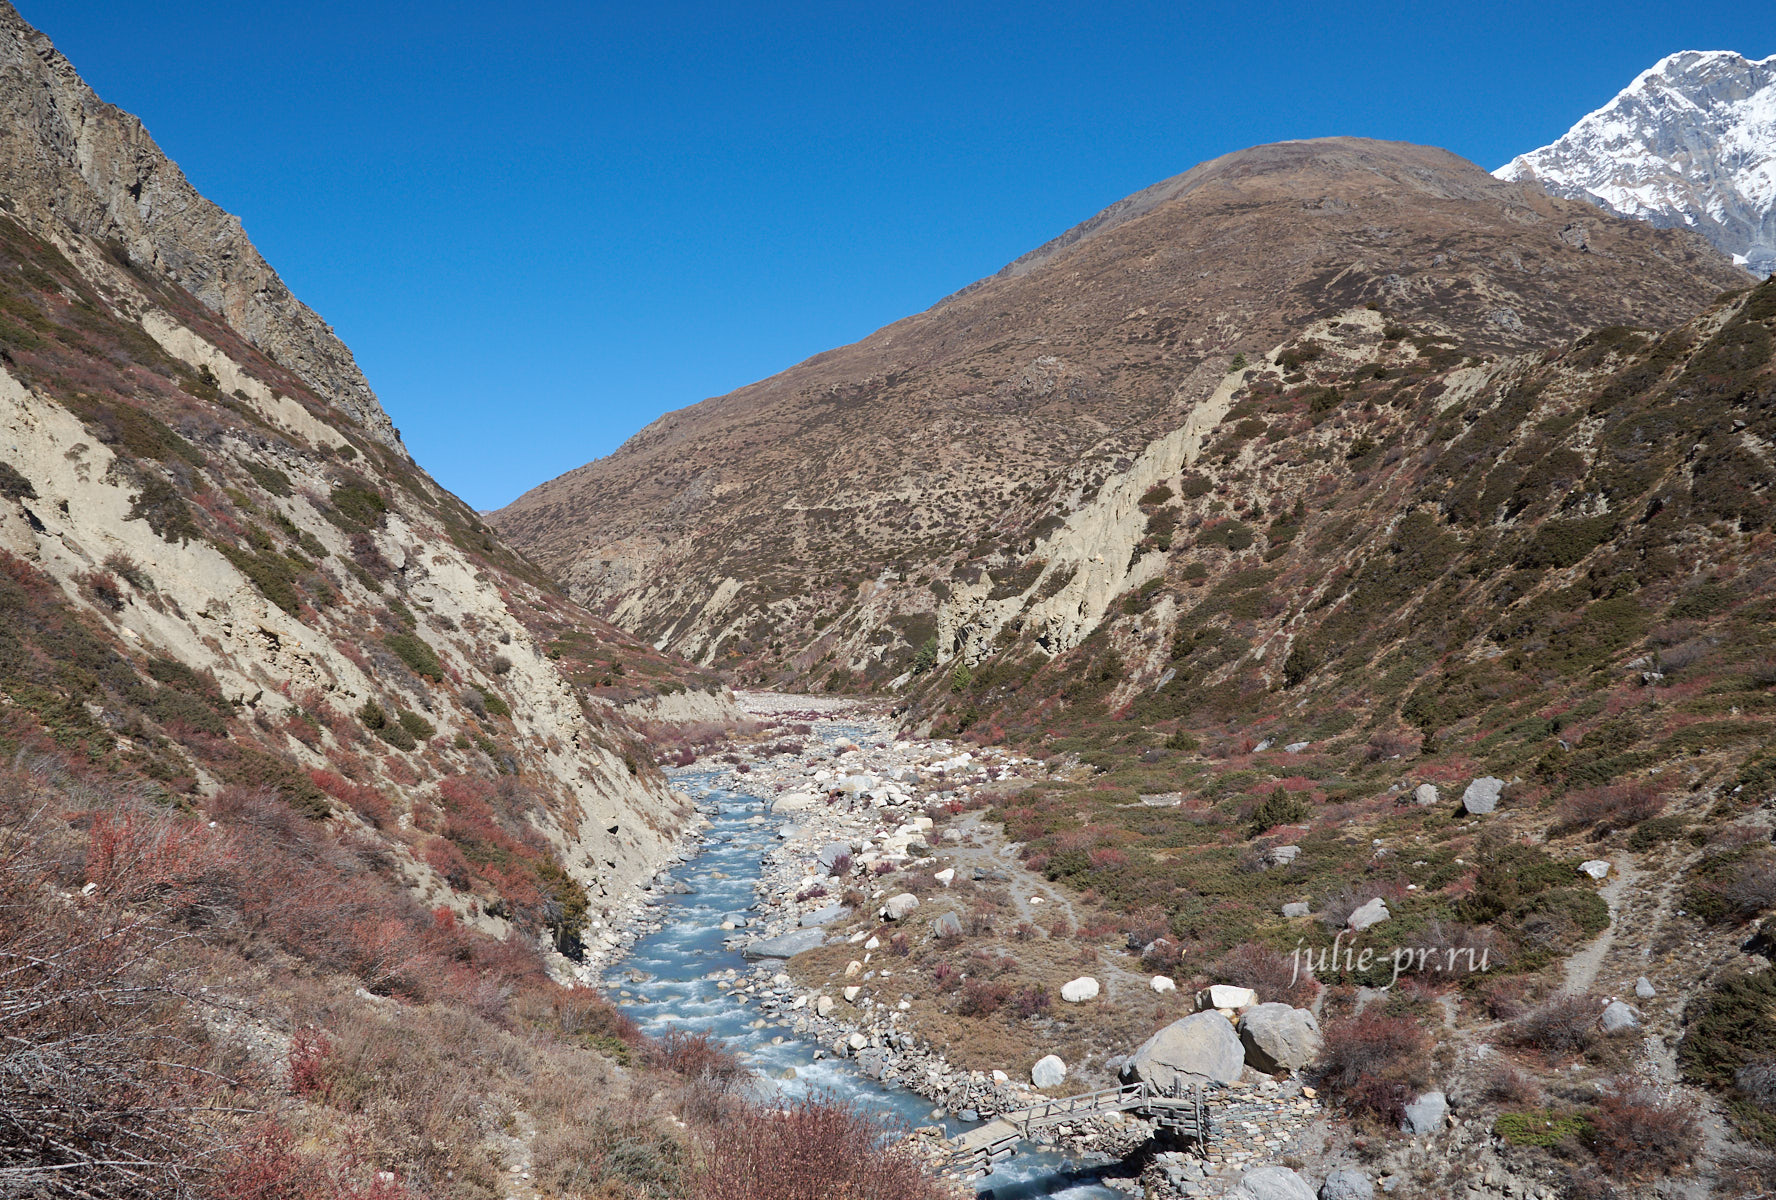 Непал. Река Джарсанг-Кхола